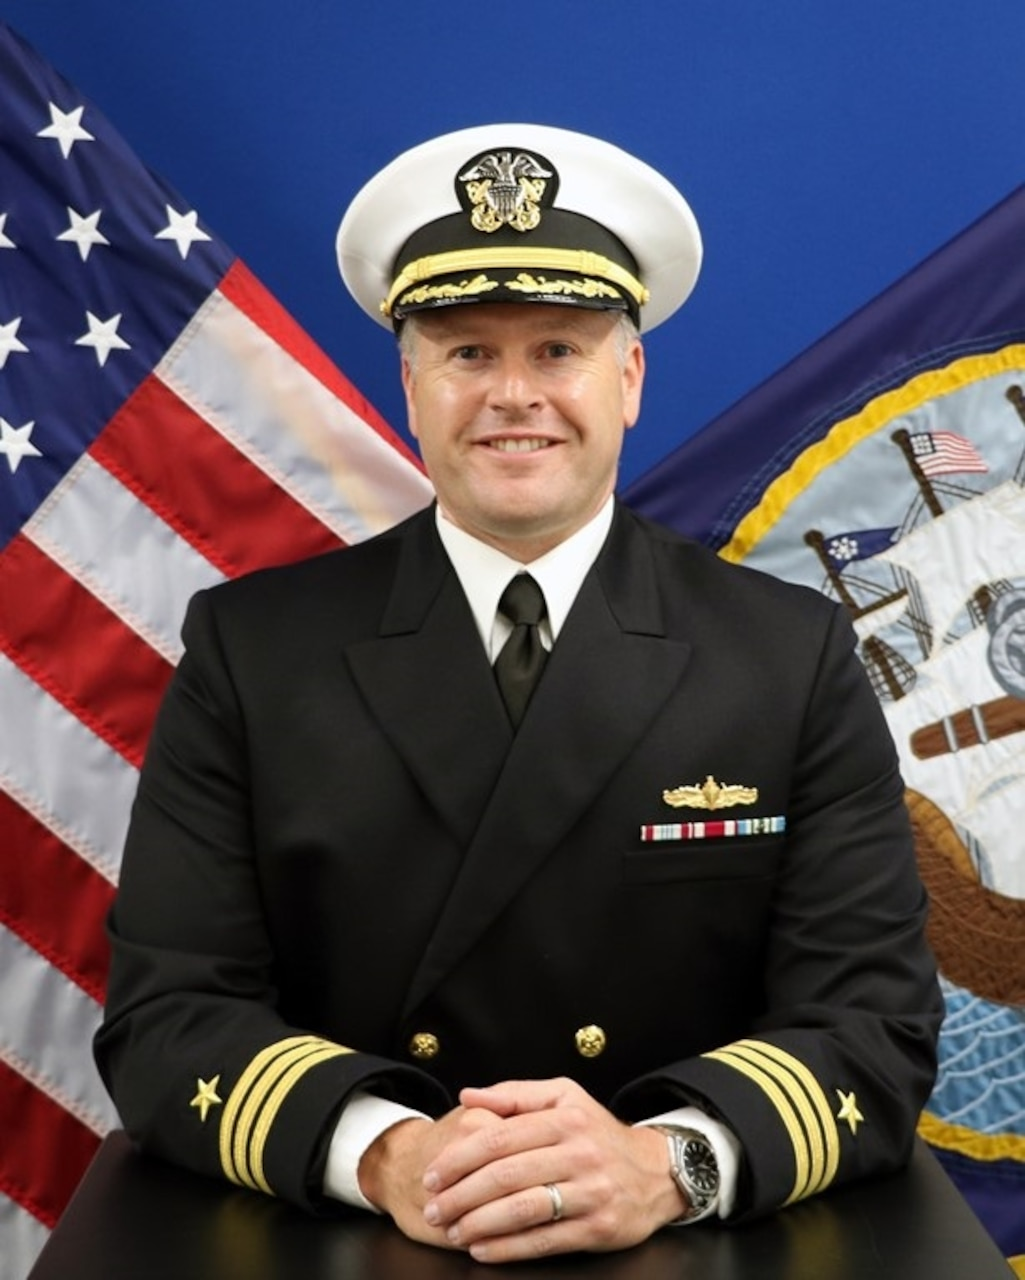 CDR Christopher M. Descovich